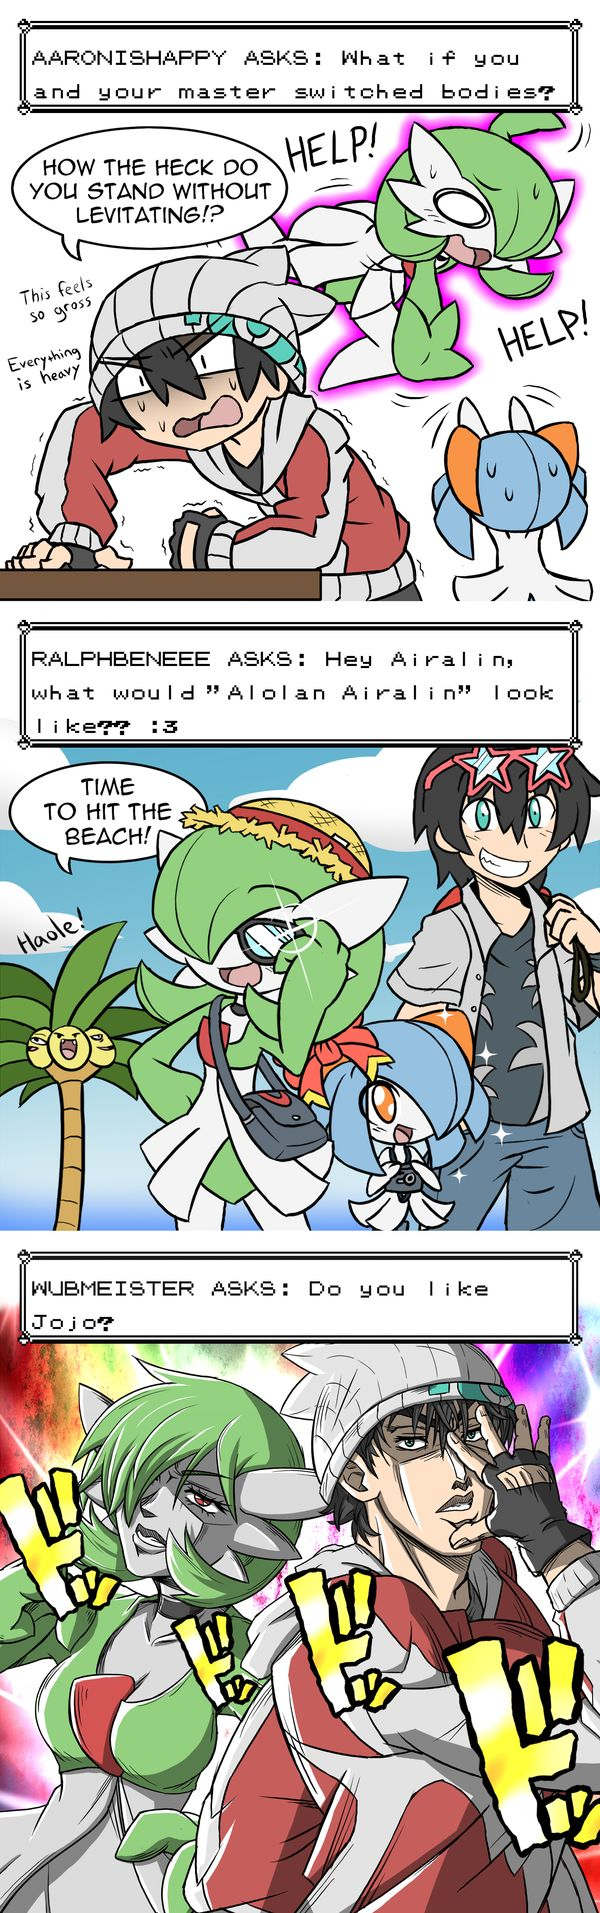 That last one lol... Oh yea if ur wondering wut Jojo is its an anime called Jojo's Bizarre Adventure